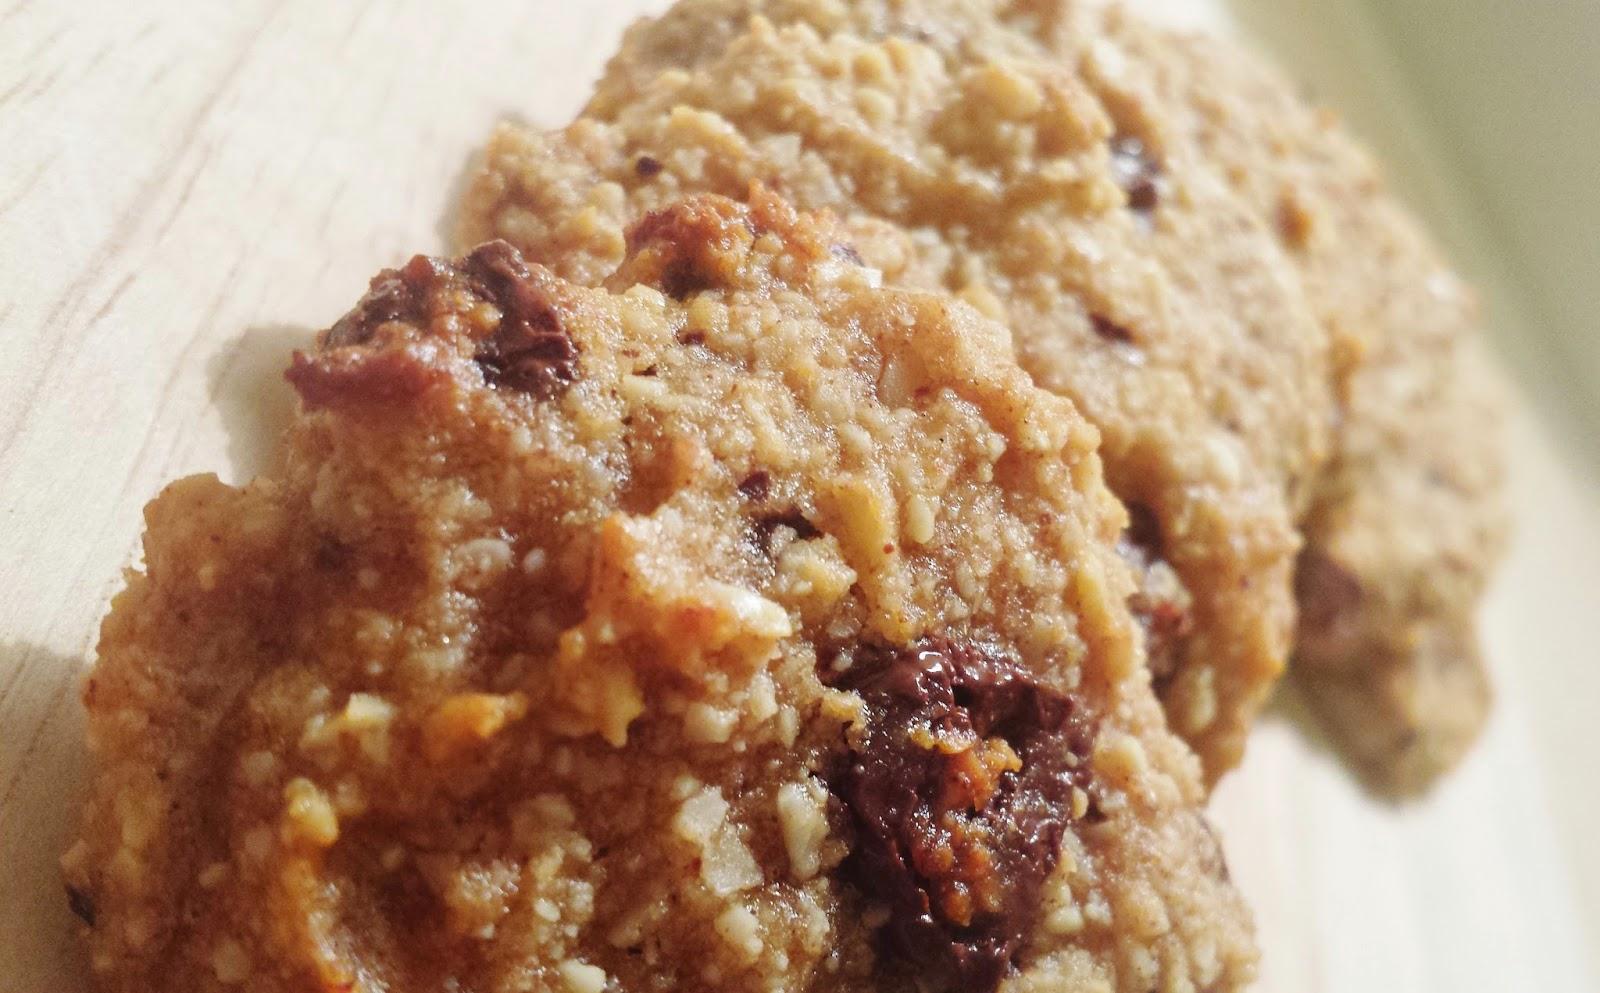 Crunchy Banana Chocolate Cookies | The Gluten Free Londoner